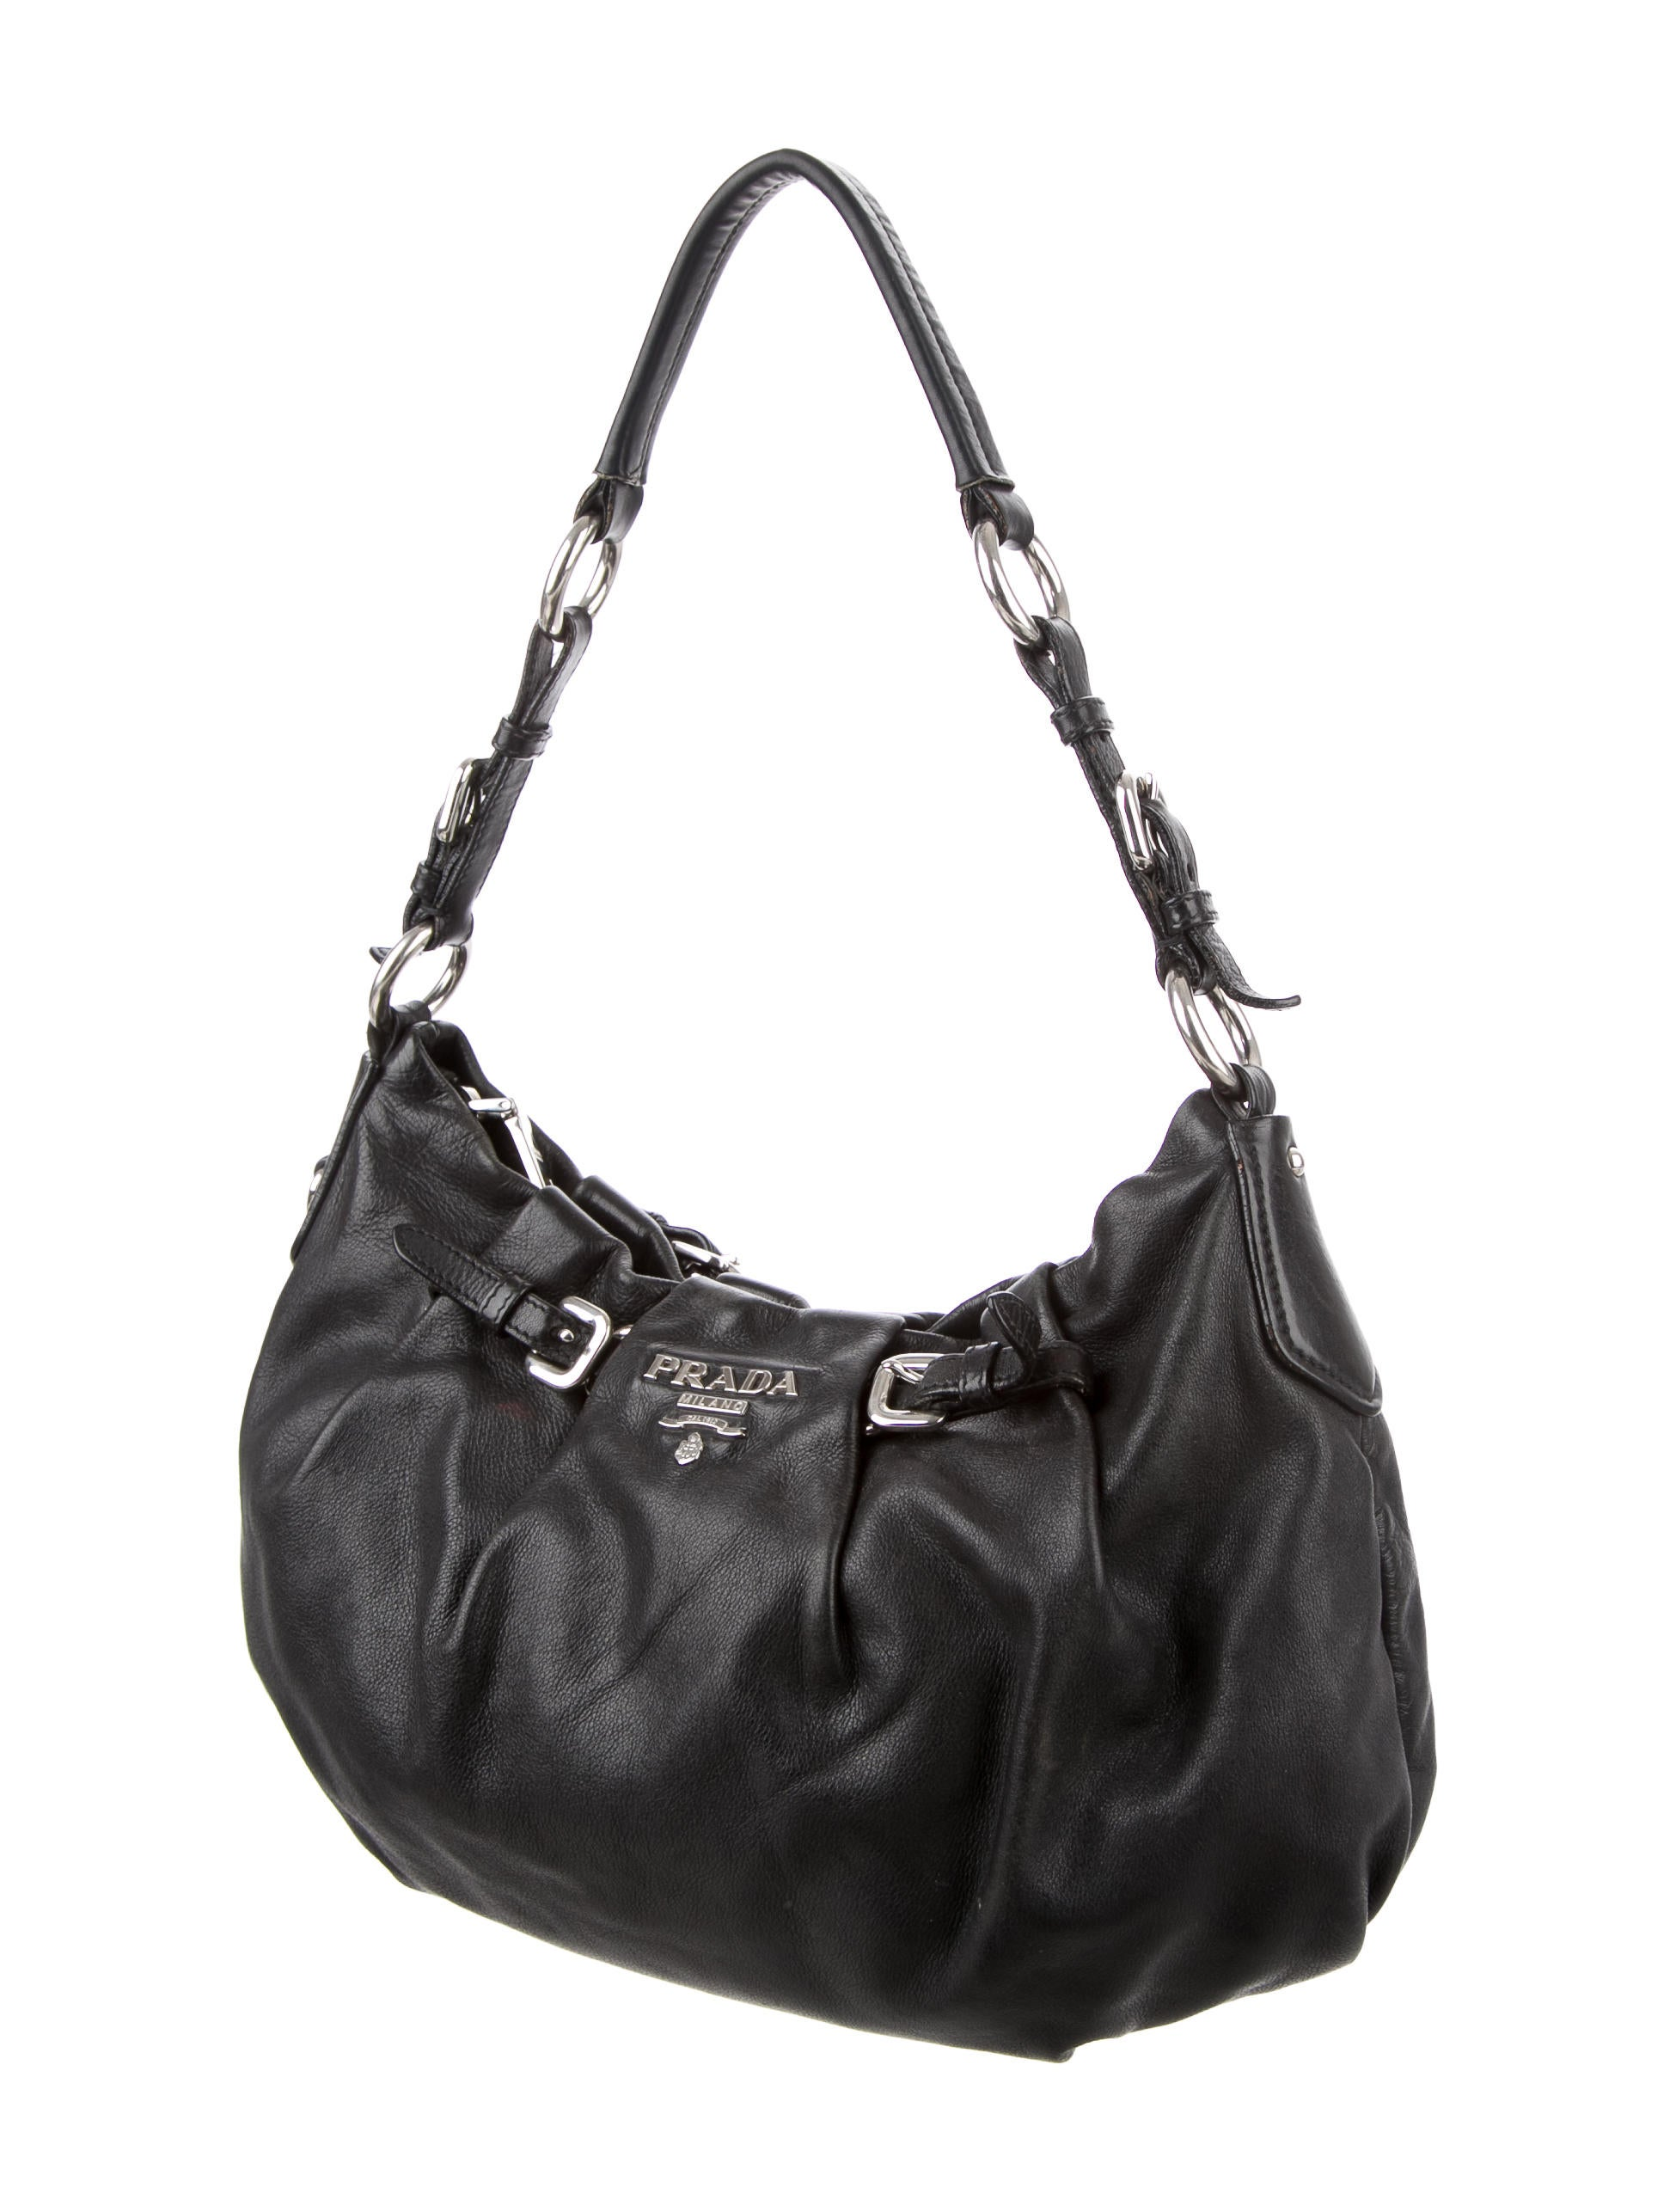 05839755af00 Prada Nappa Leather Shoulder Bag - Handbags - PRA133647   The RealReal